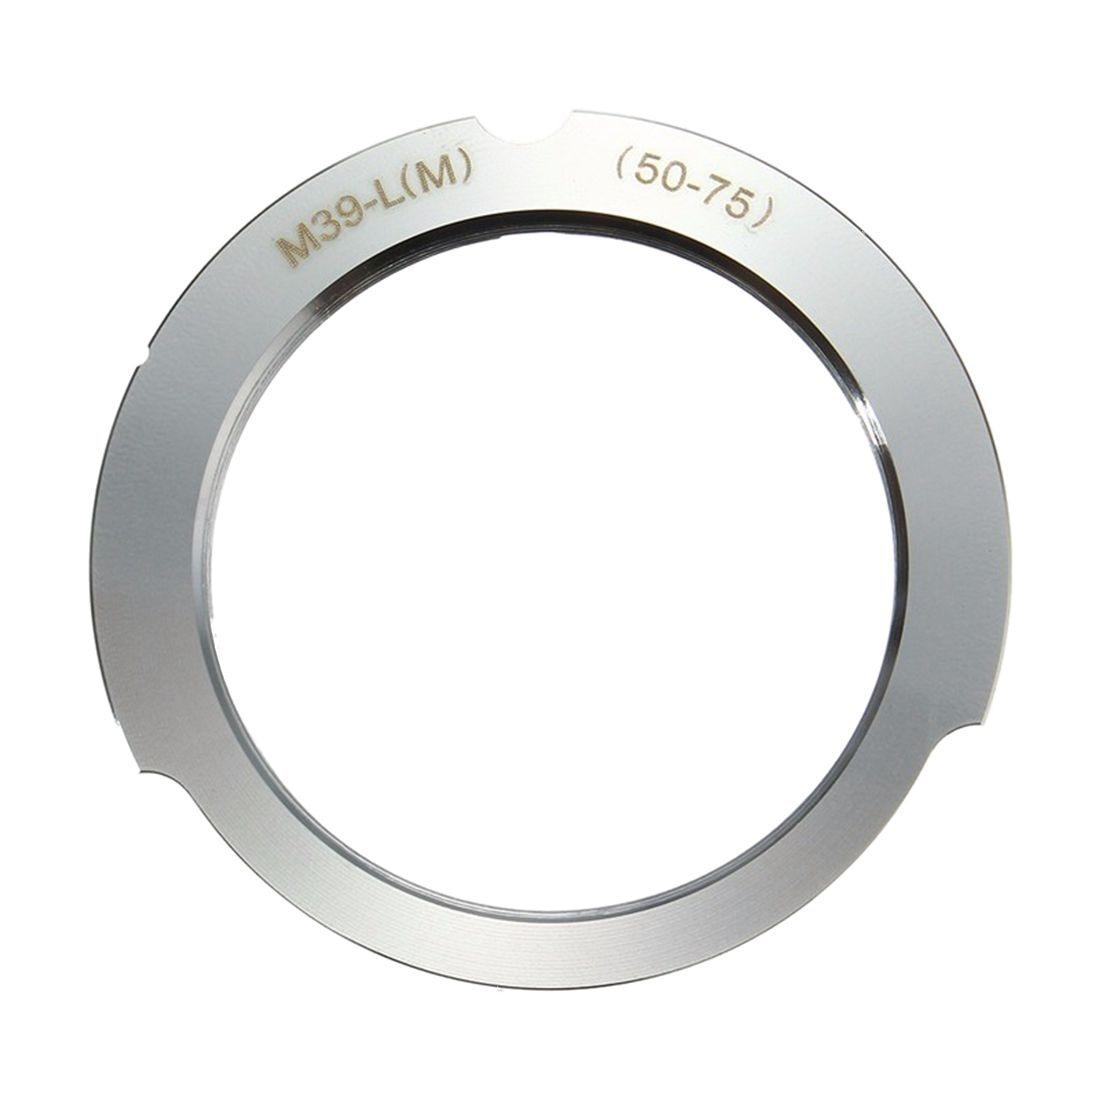 Camera Lens Mount Adapter 50-75mm For Leica Thread Screw Mount M39-L(M) LSM LTM